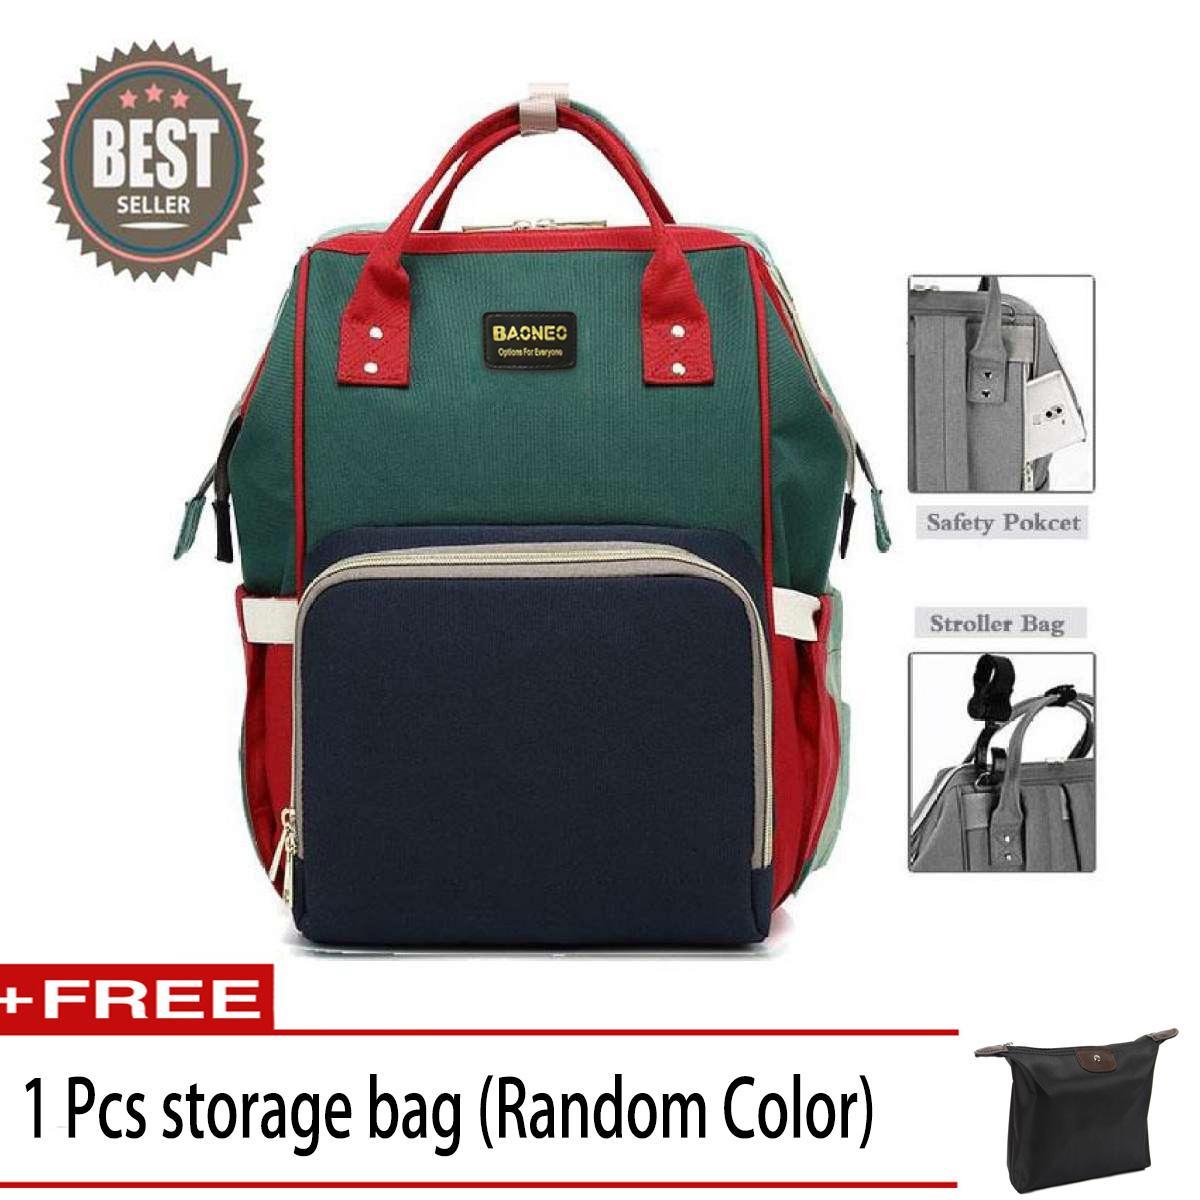 83d99f390080 New Upgrade Fashion Mummy Maternity Nappy Bag Large Capacity Baby Bag  Travel Backpack Designer Nursing Bag Baby Care